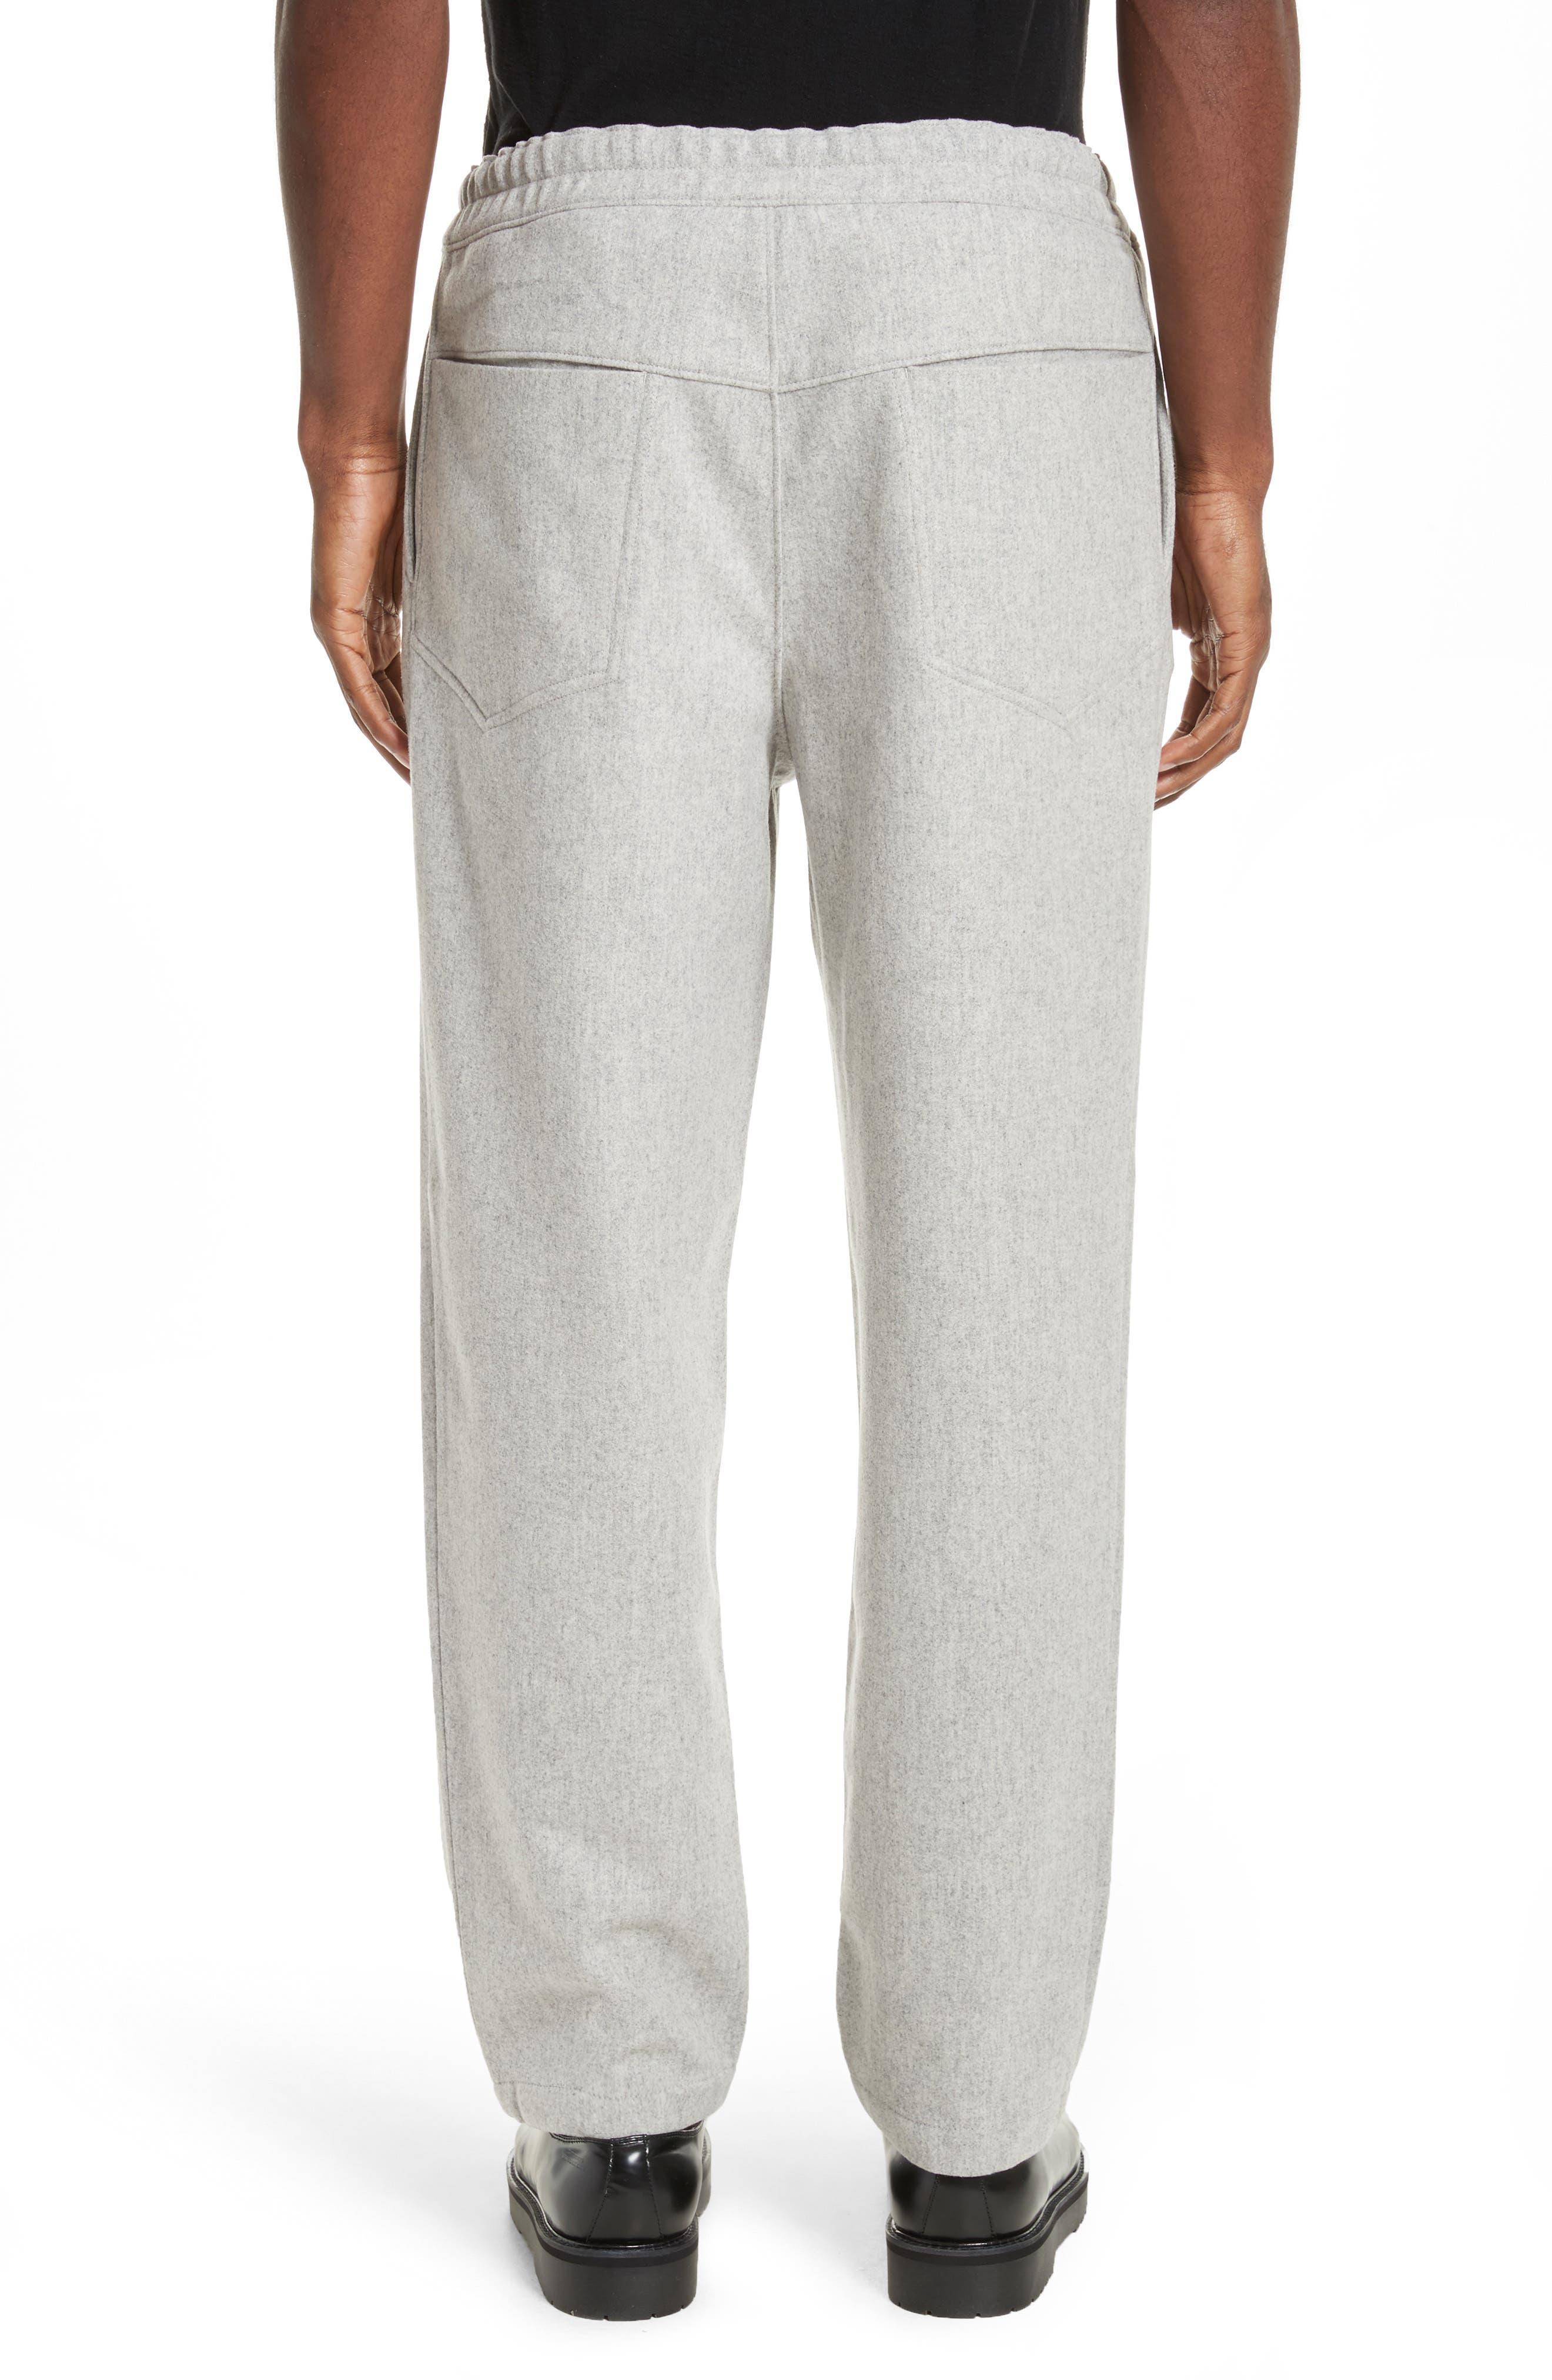 Mélange Wool Blend Trousers,                             Alternate thumbnail 2, color,                             Light Grey Melange